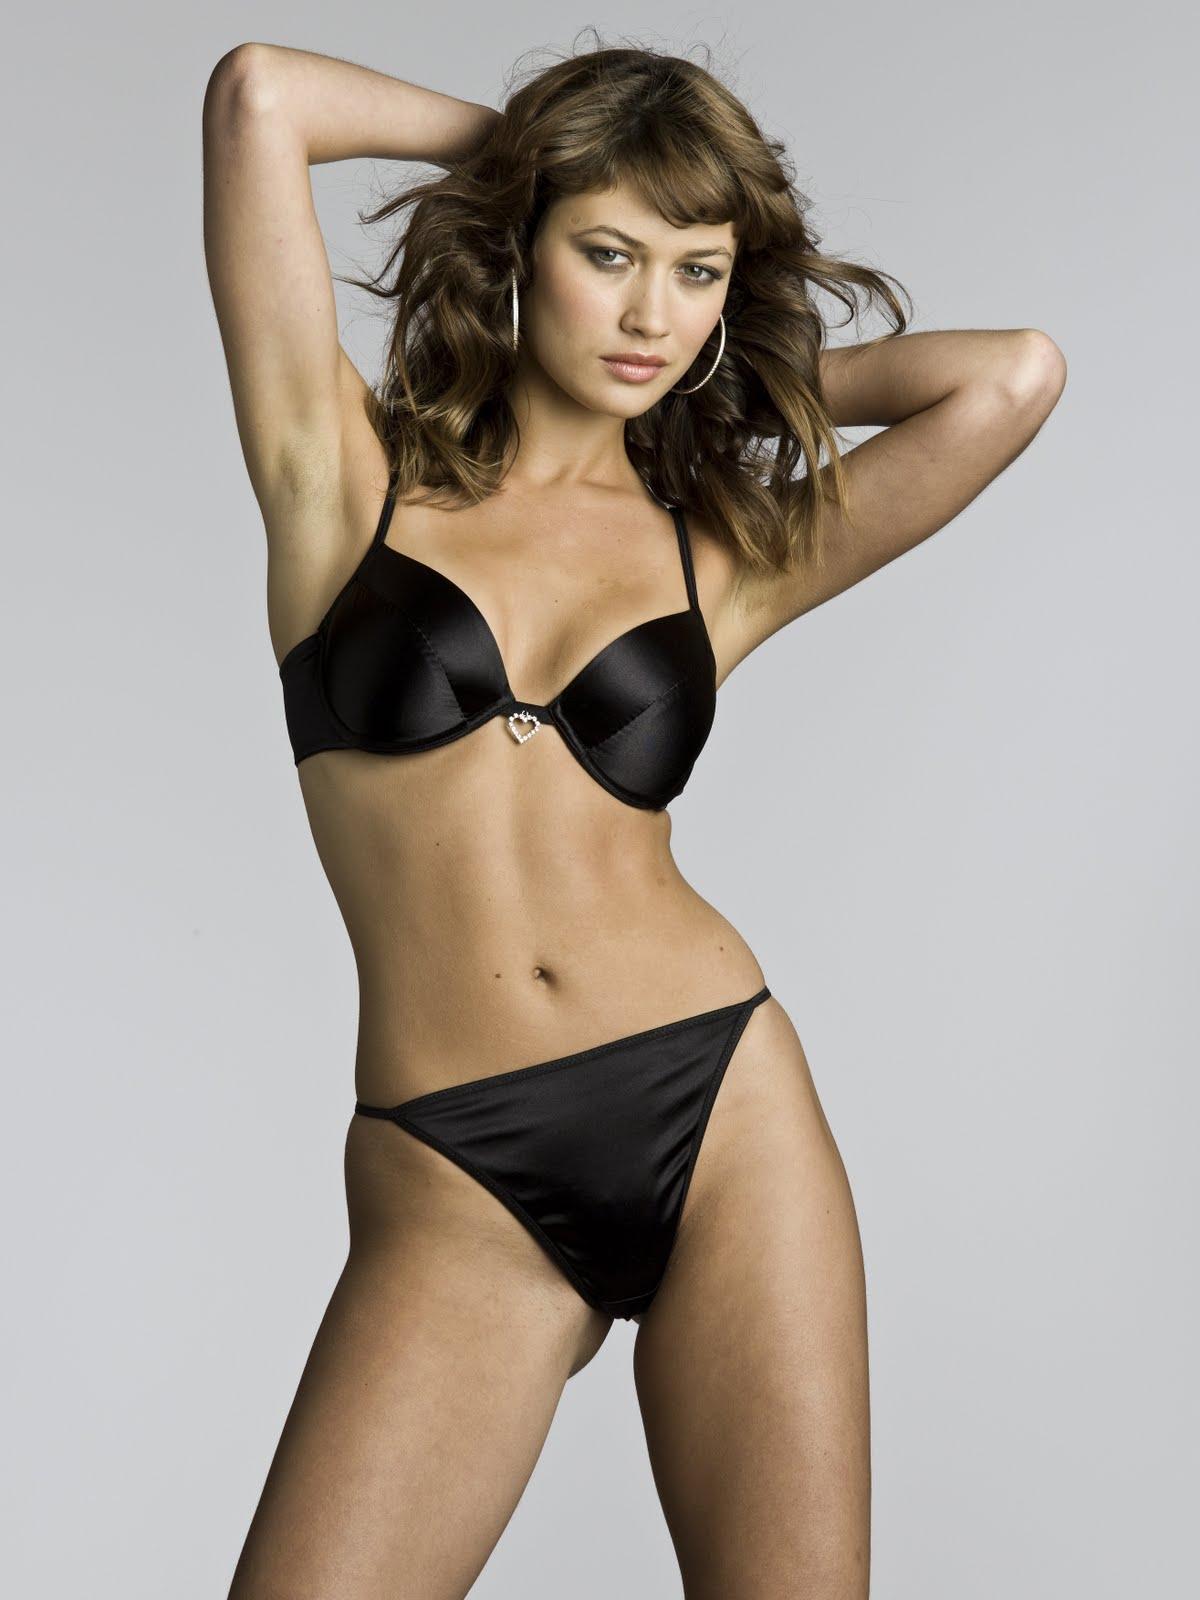 Swimsuit Olga Kurylenko UKR nudes (94 photos) Erotica, iCloud, panties